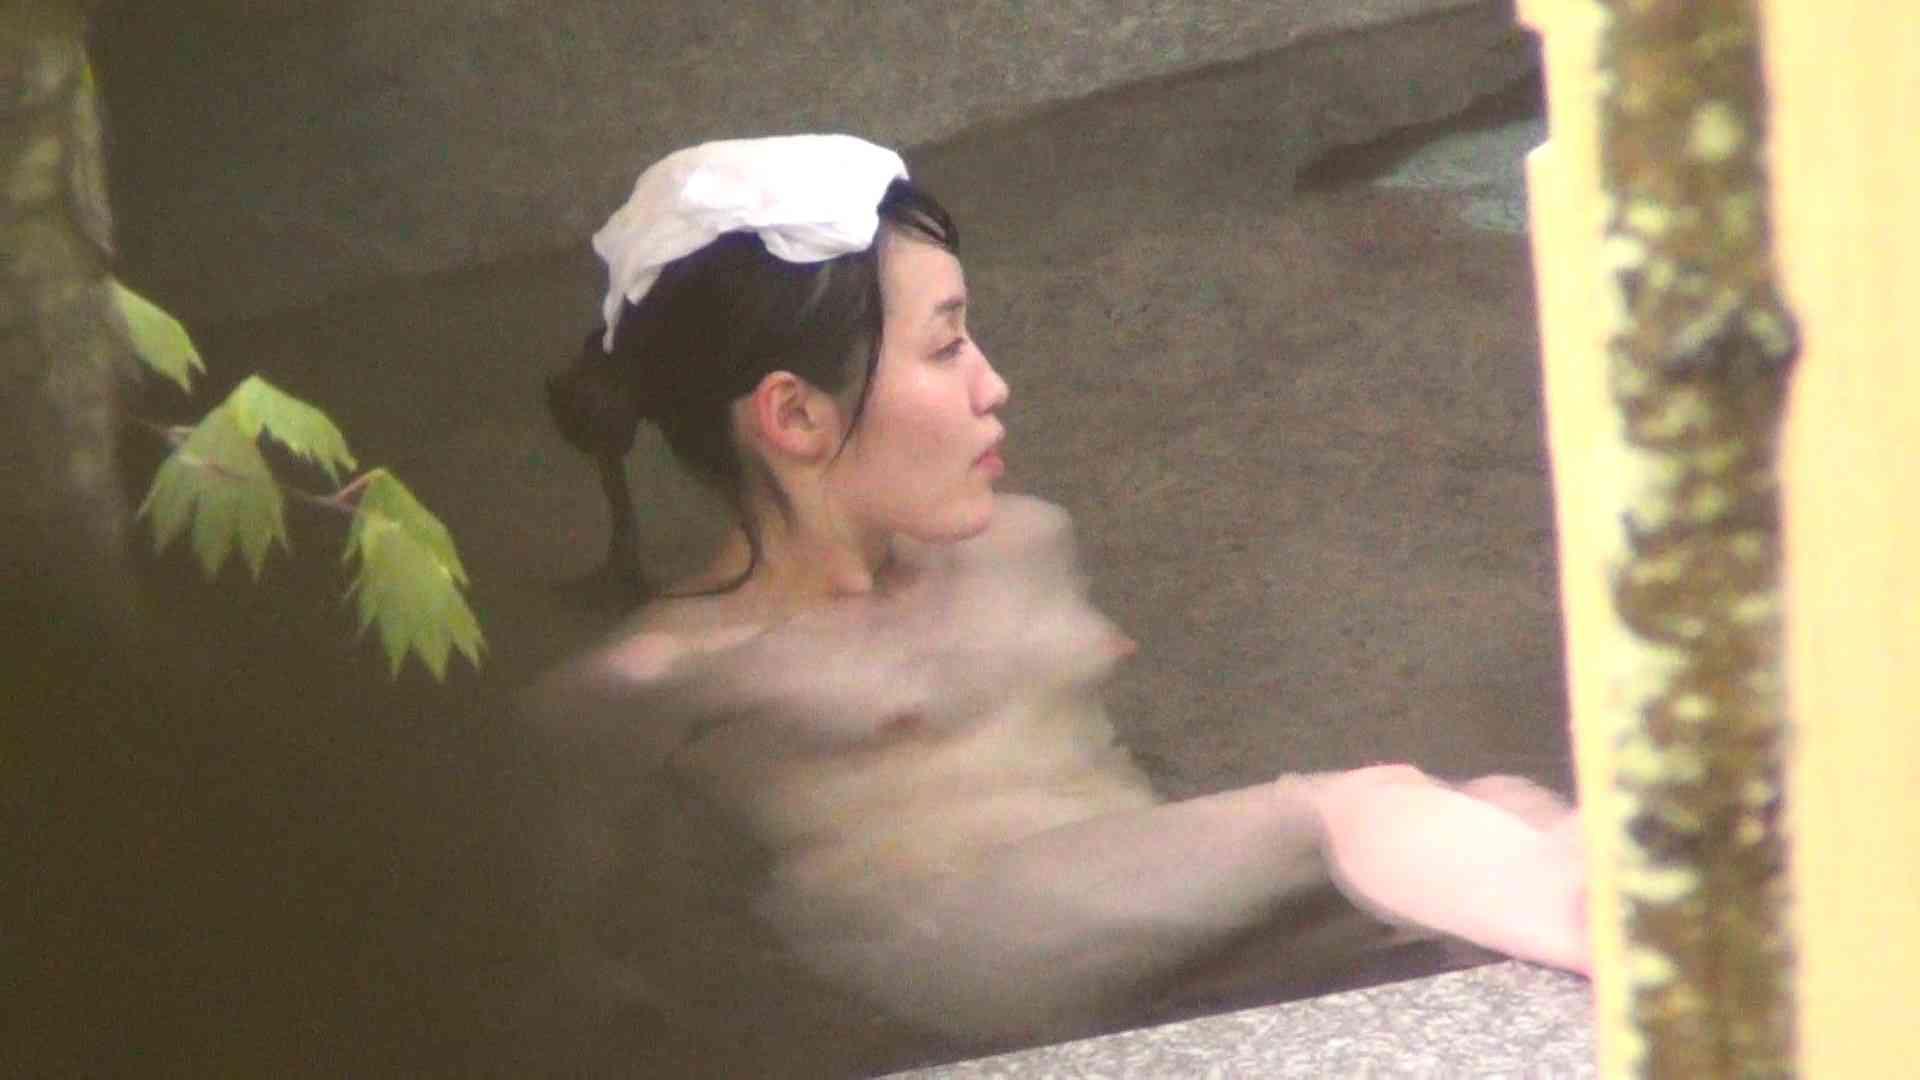 Aquaな露天風呂Vol.235 0 | 0  51連発 49